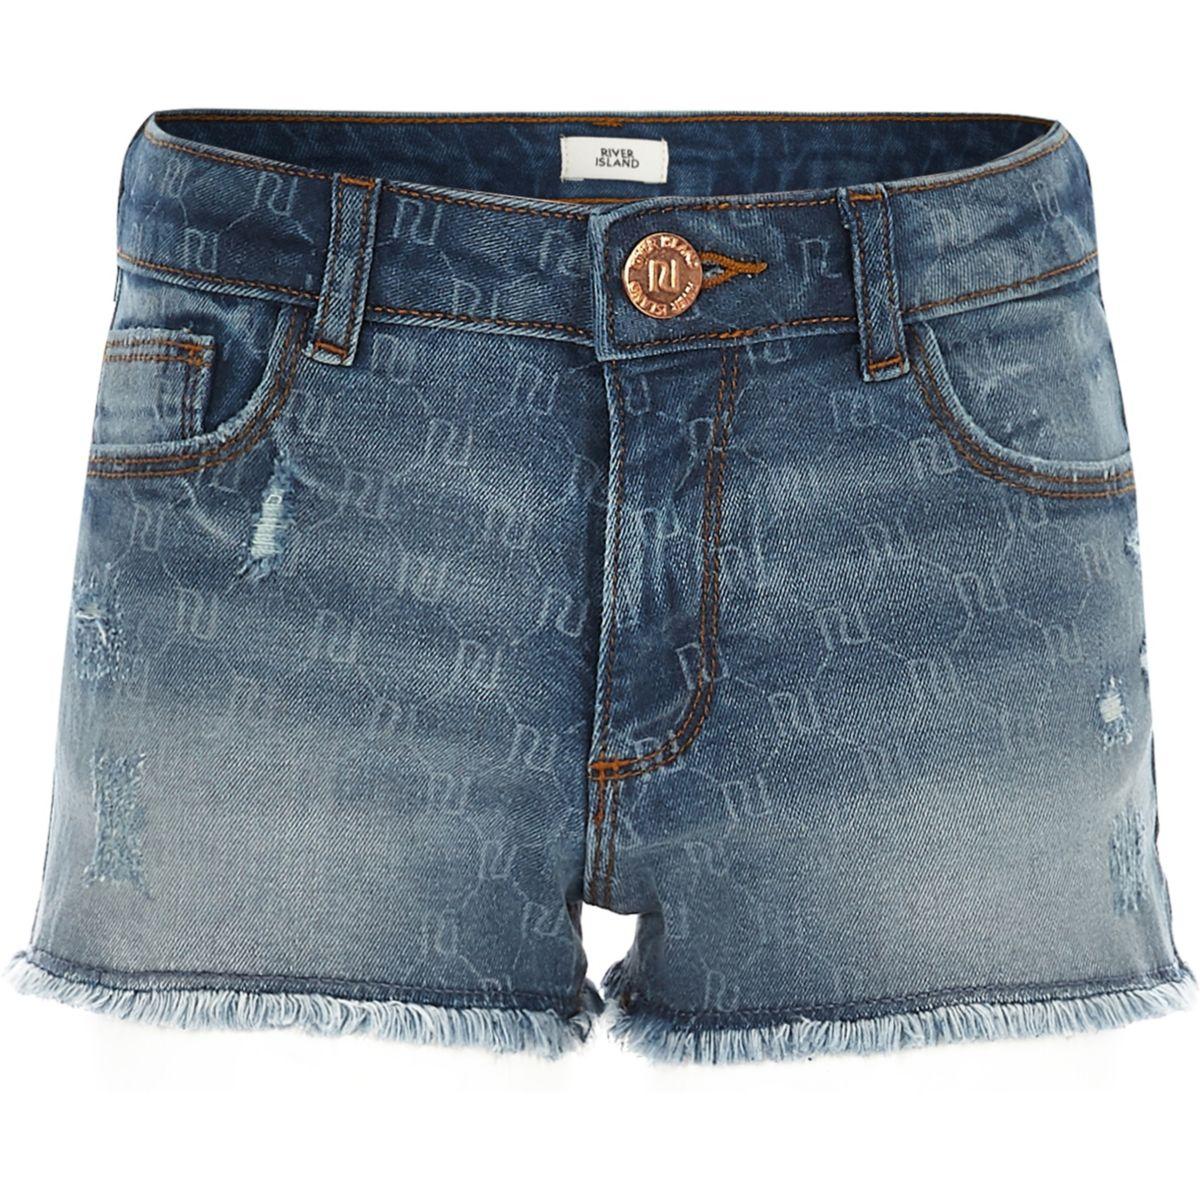 Girls RI monogram denim shorts